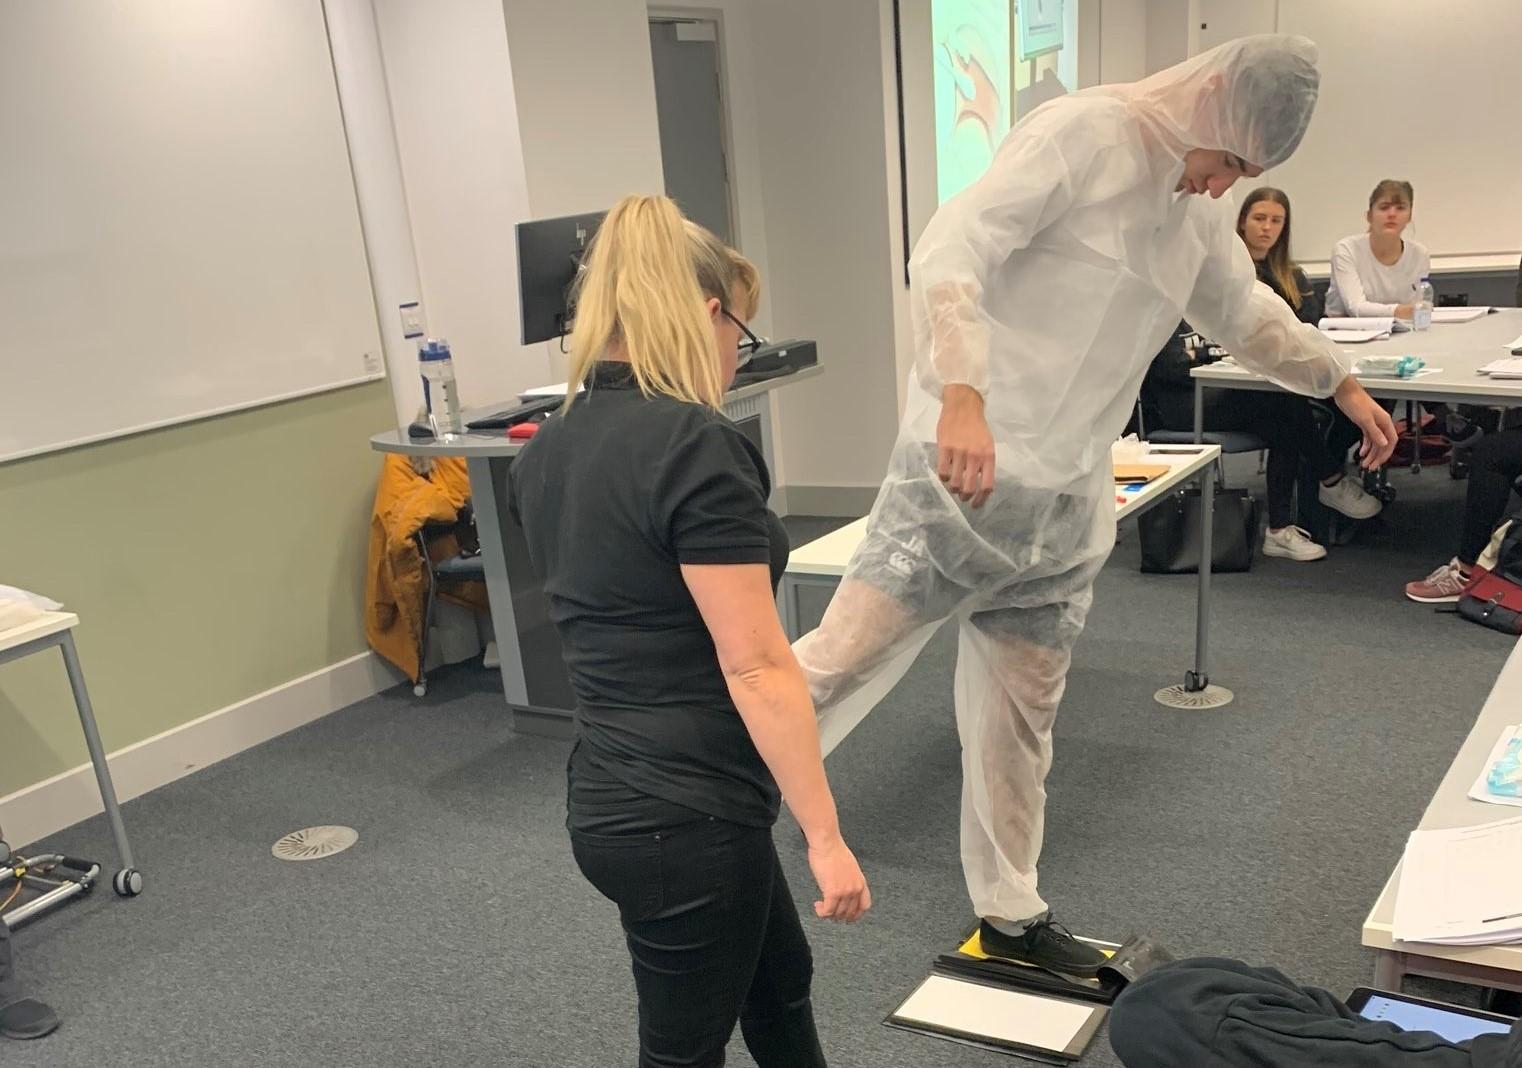 CSI Training and Events - CSI Educational Workshops - student taking part in a custody process procedure at Sheffield Hallam University